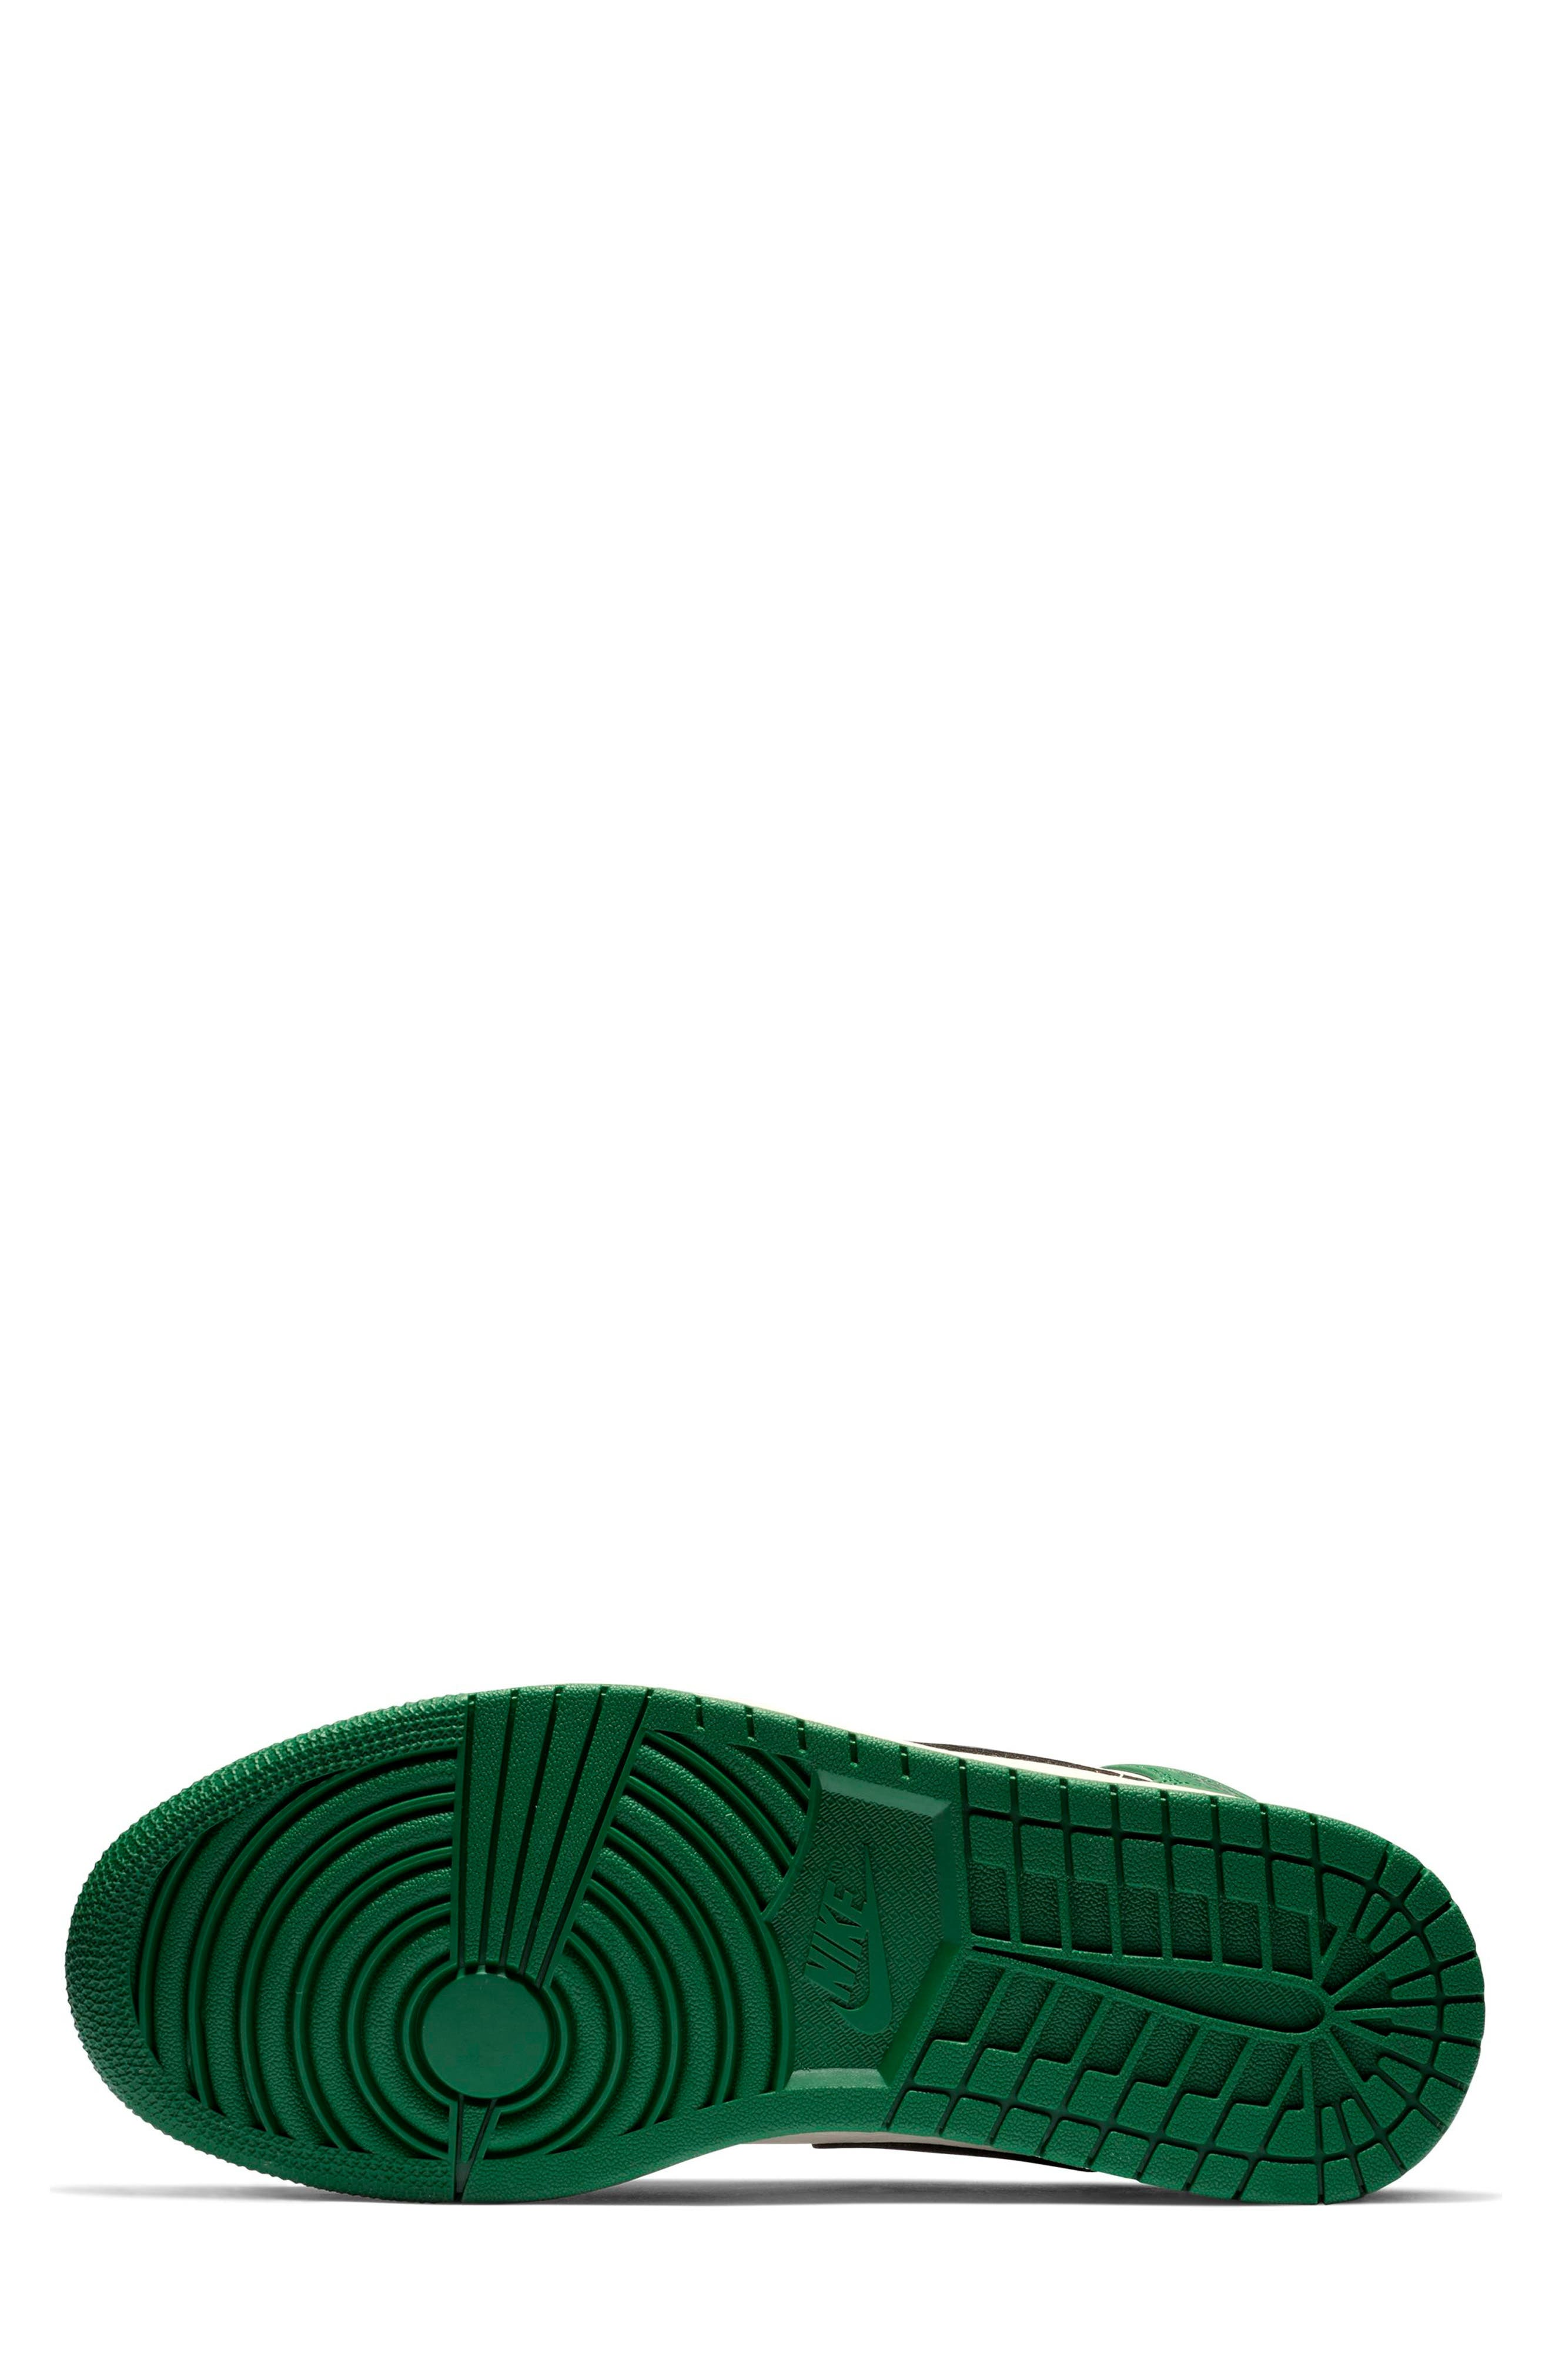 NIKE, Air Jordan 1 Mid Winterized Sneaker, Alternate thumbnail 4, color, 301